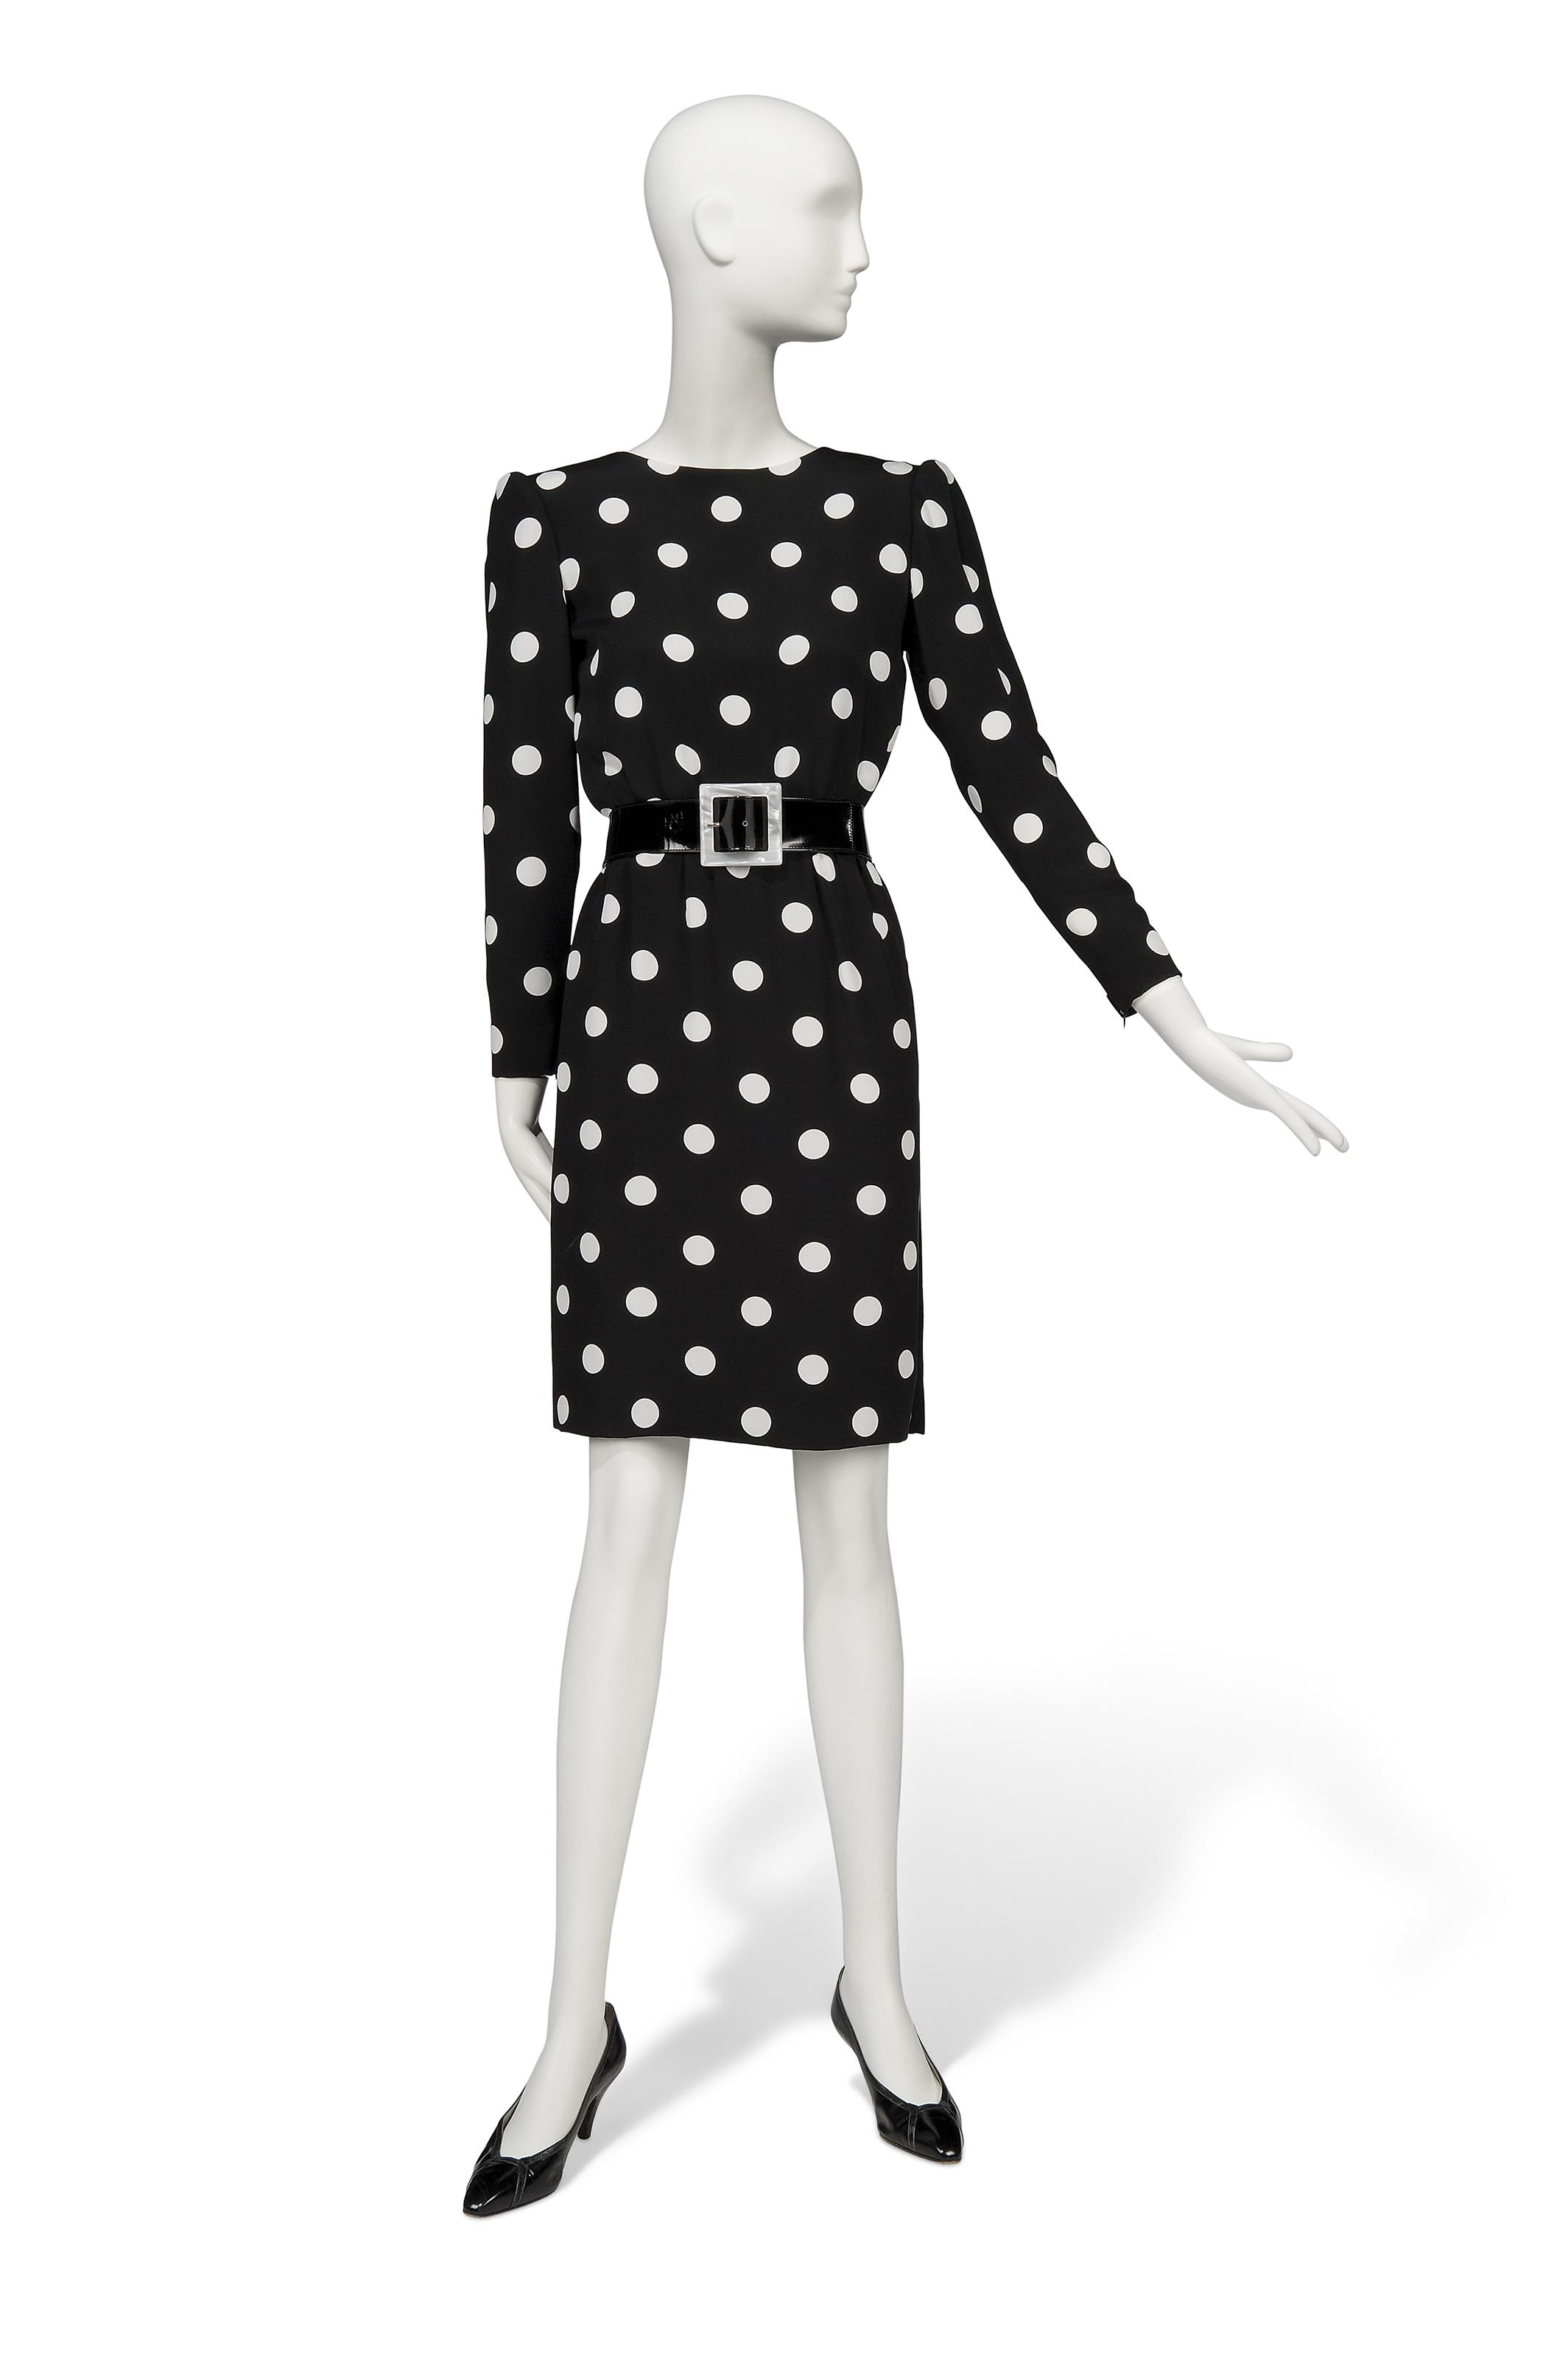 A BLACK AND WHITE POLKADOT SILK CREPE COCKTAIL DRESS